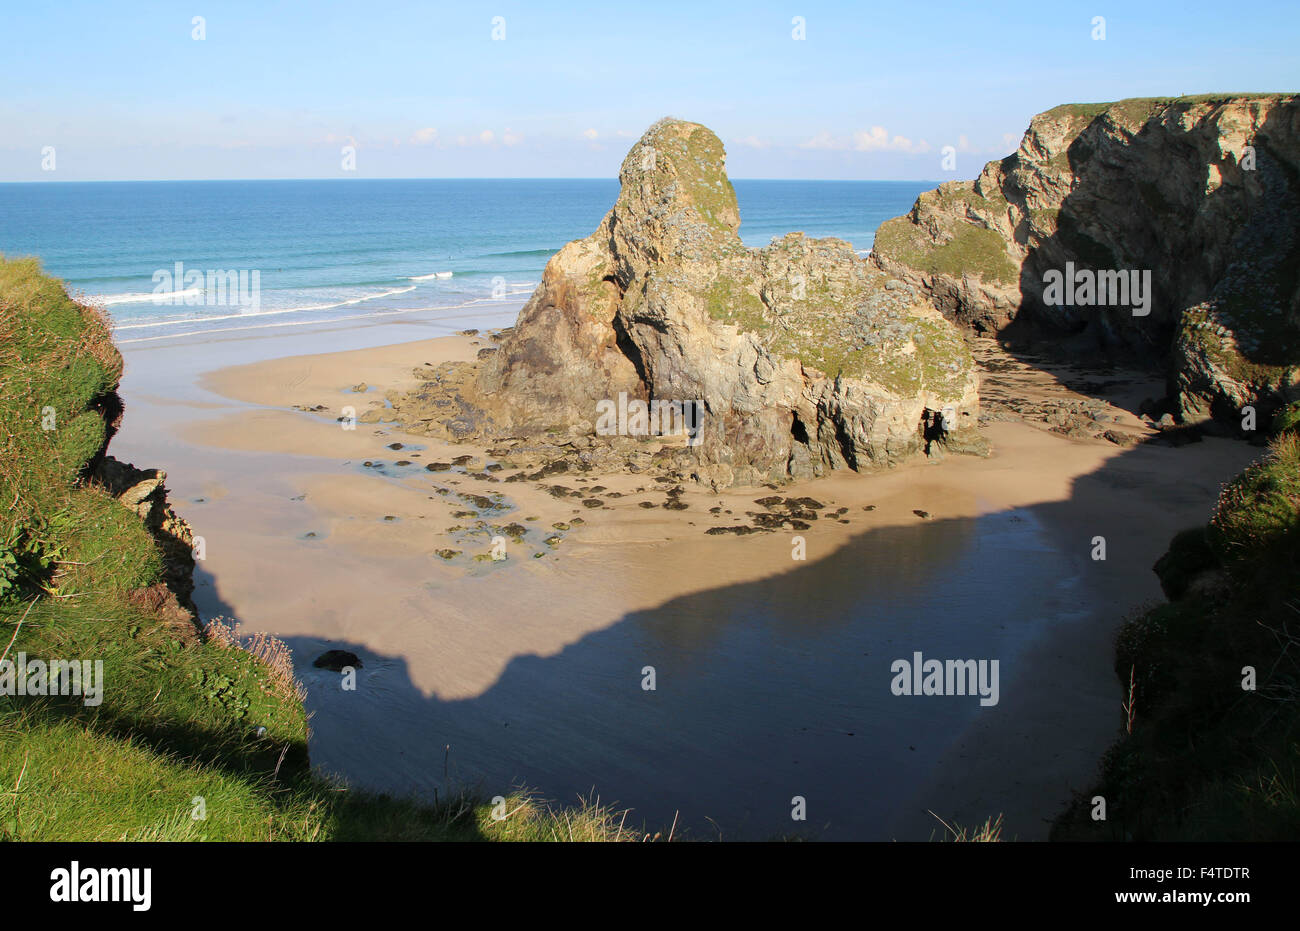 Porth Island Whipsiderry Beach Newquay Cornwall - Stock Image